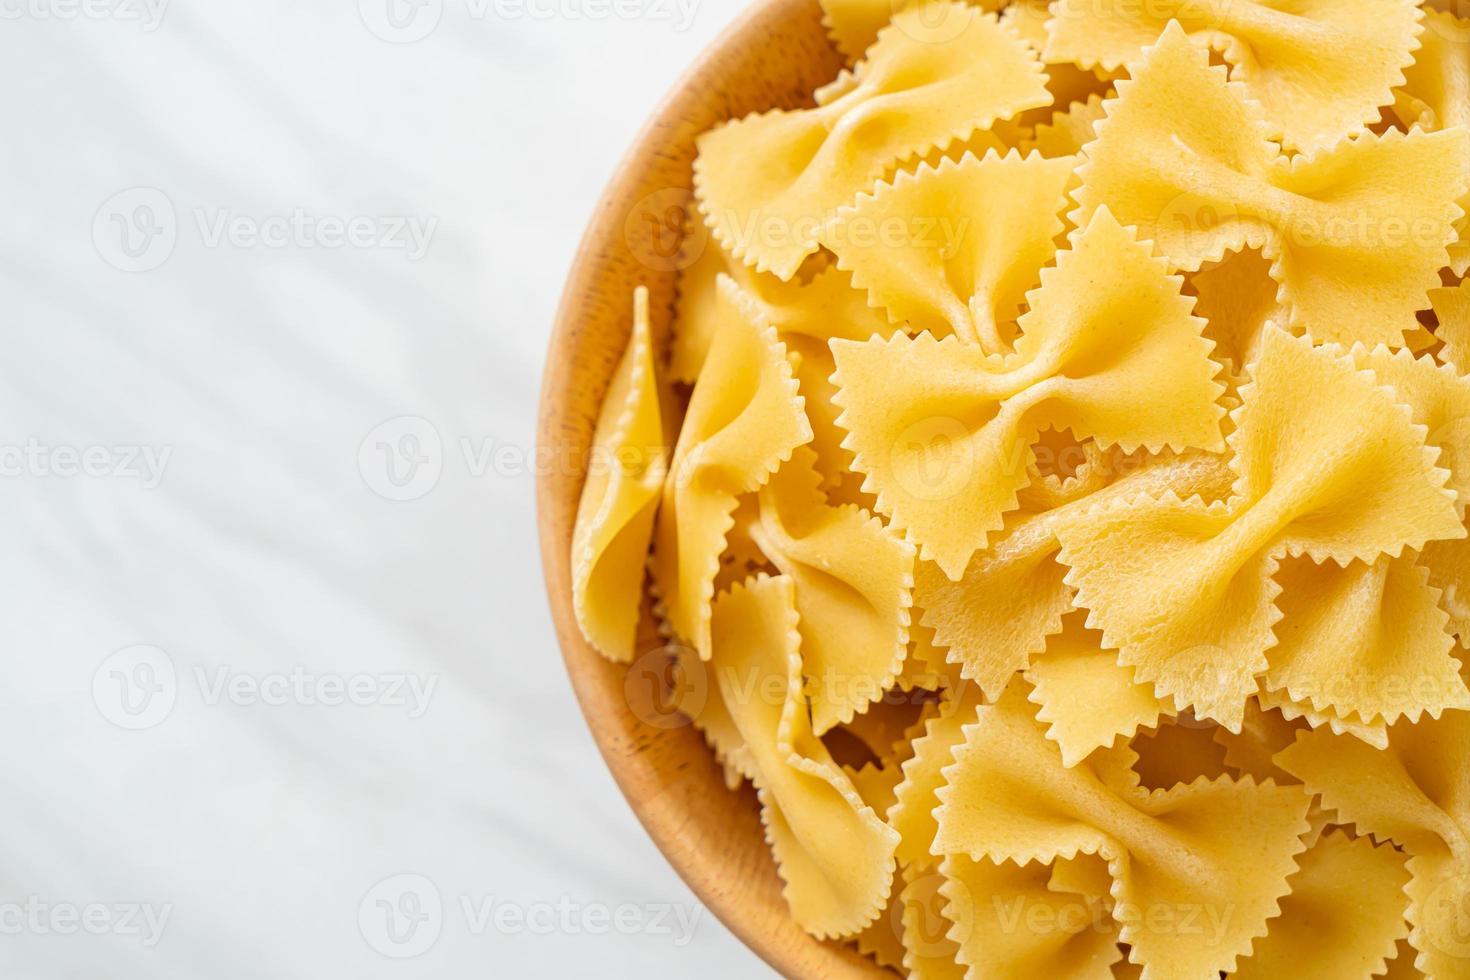 pâtes farfalle non cuites sèches dans un bol photo